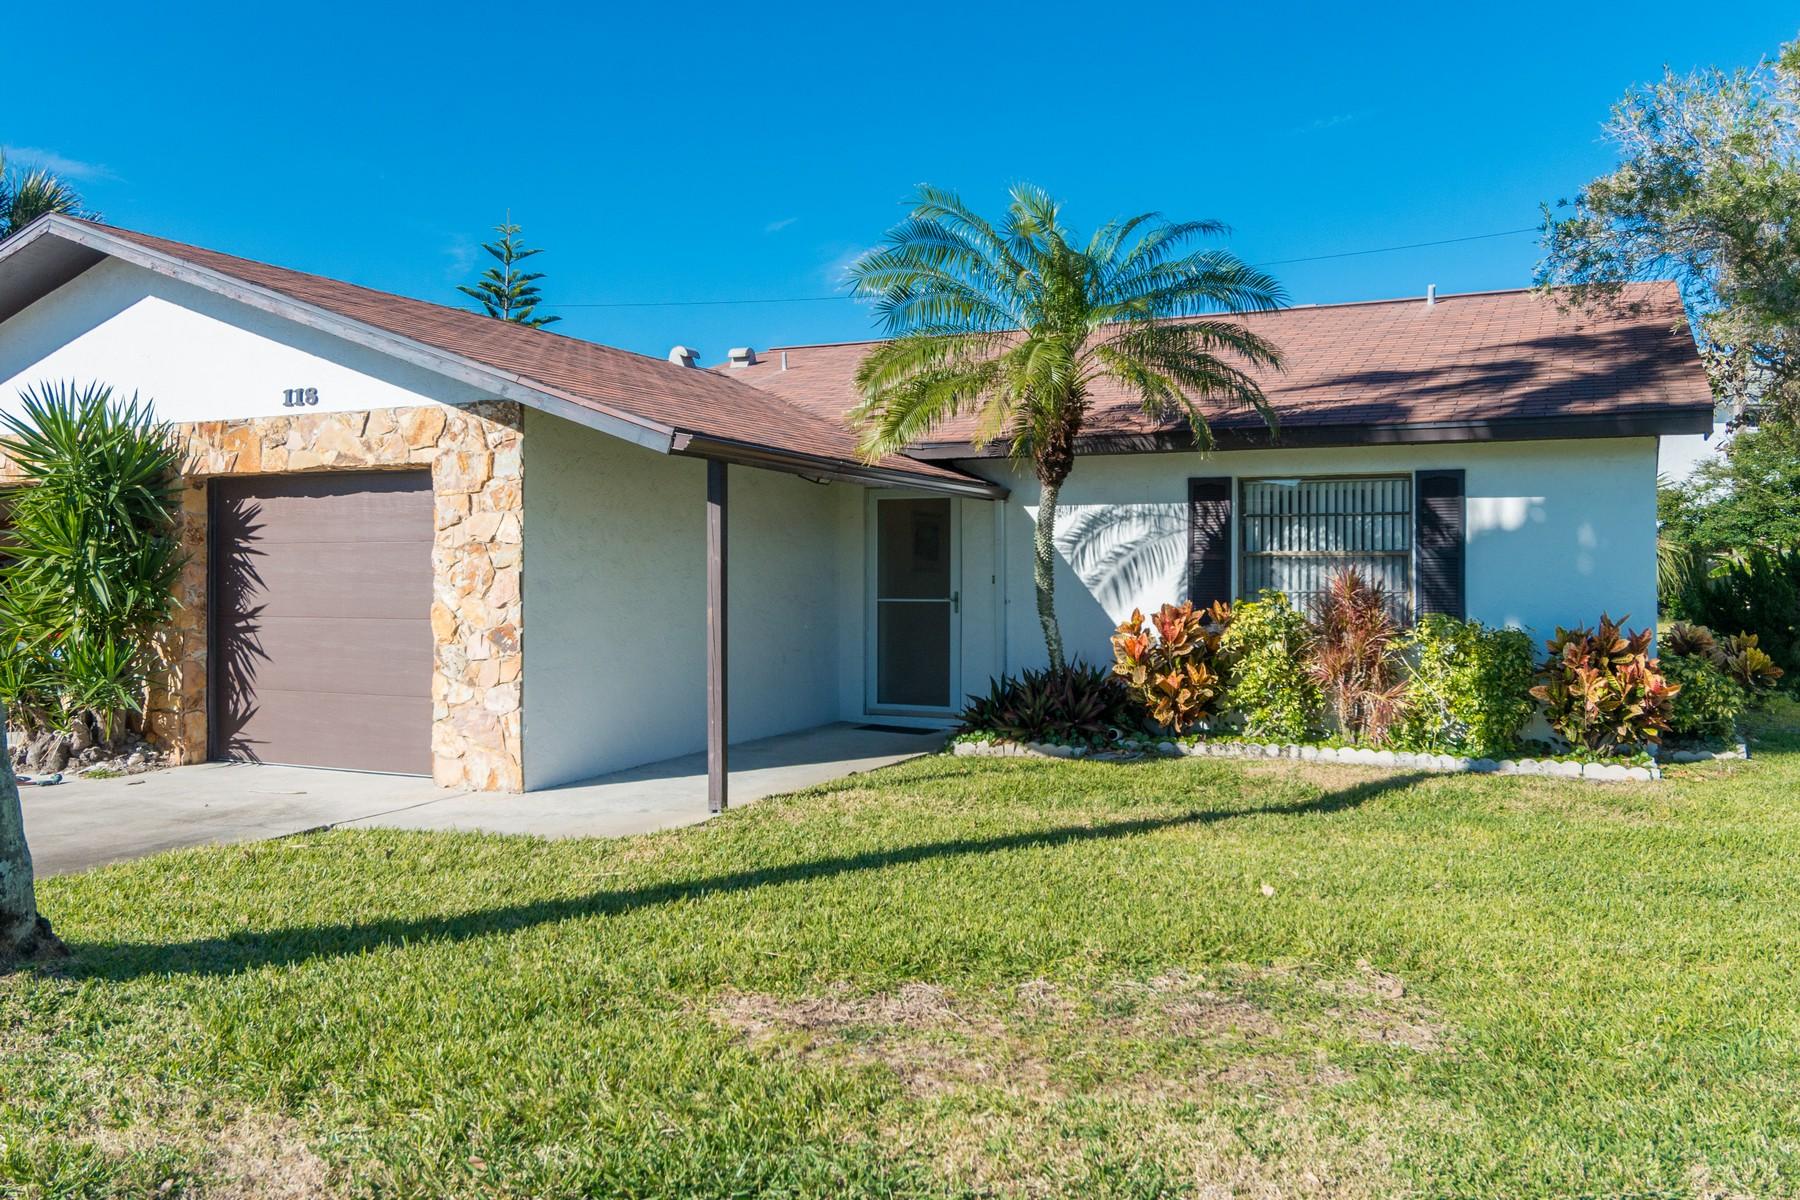 Condominium for Sale at The Heritage Condo 118 Harmony Place Melbourne Beach, Florida, 32951 United States